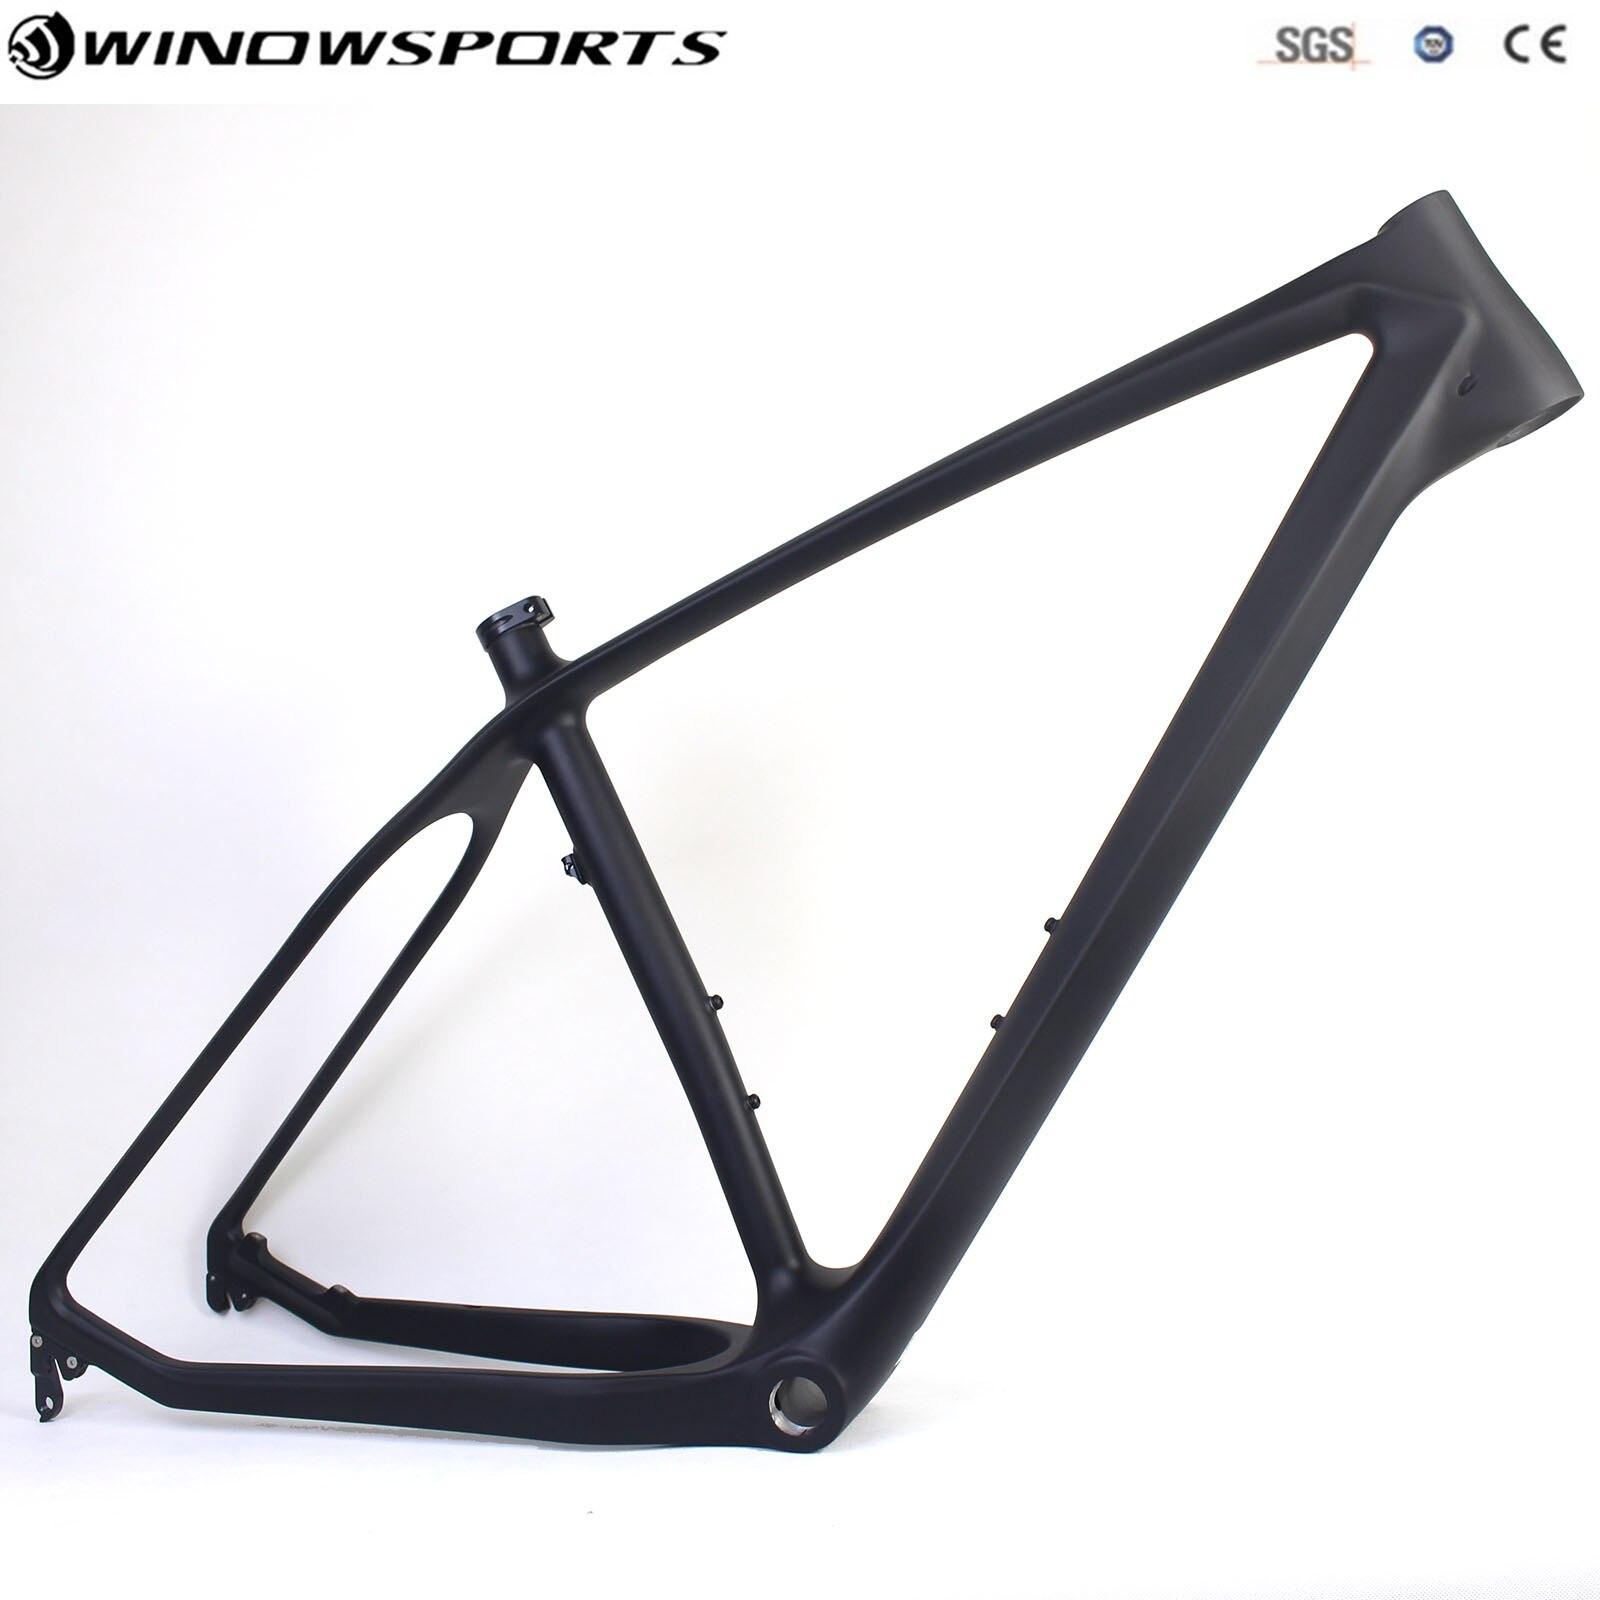 Hot Selling Carbon Fat Bike Frame BSA Carbon Snow Bike Frameset Snow Bike Frame Fatty Frame 197/190 Rear Space For Exchange